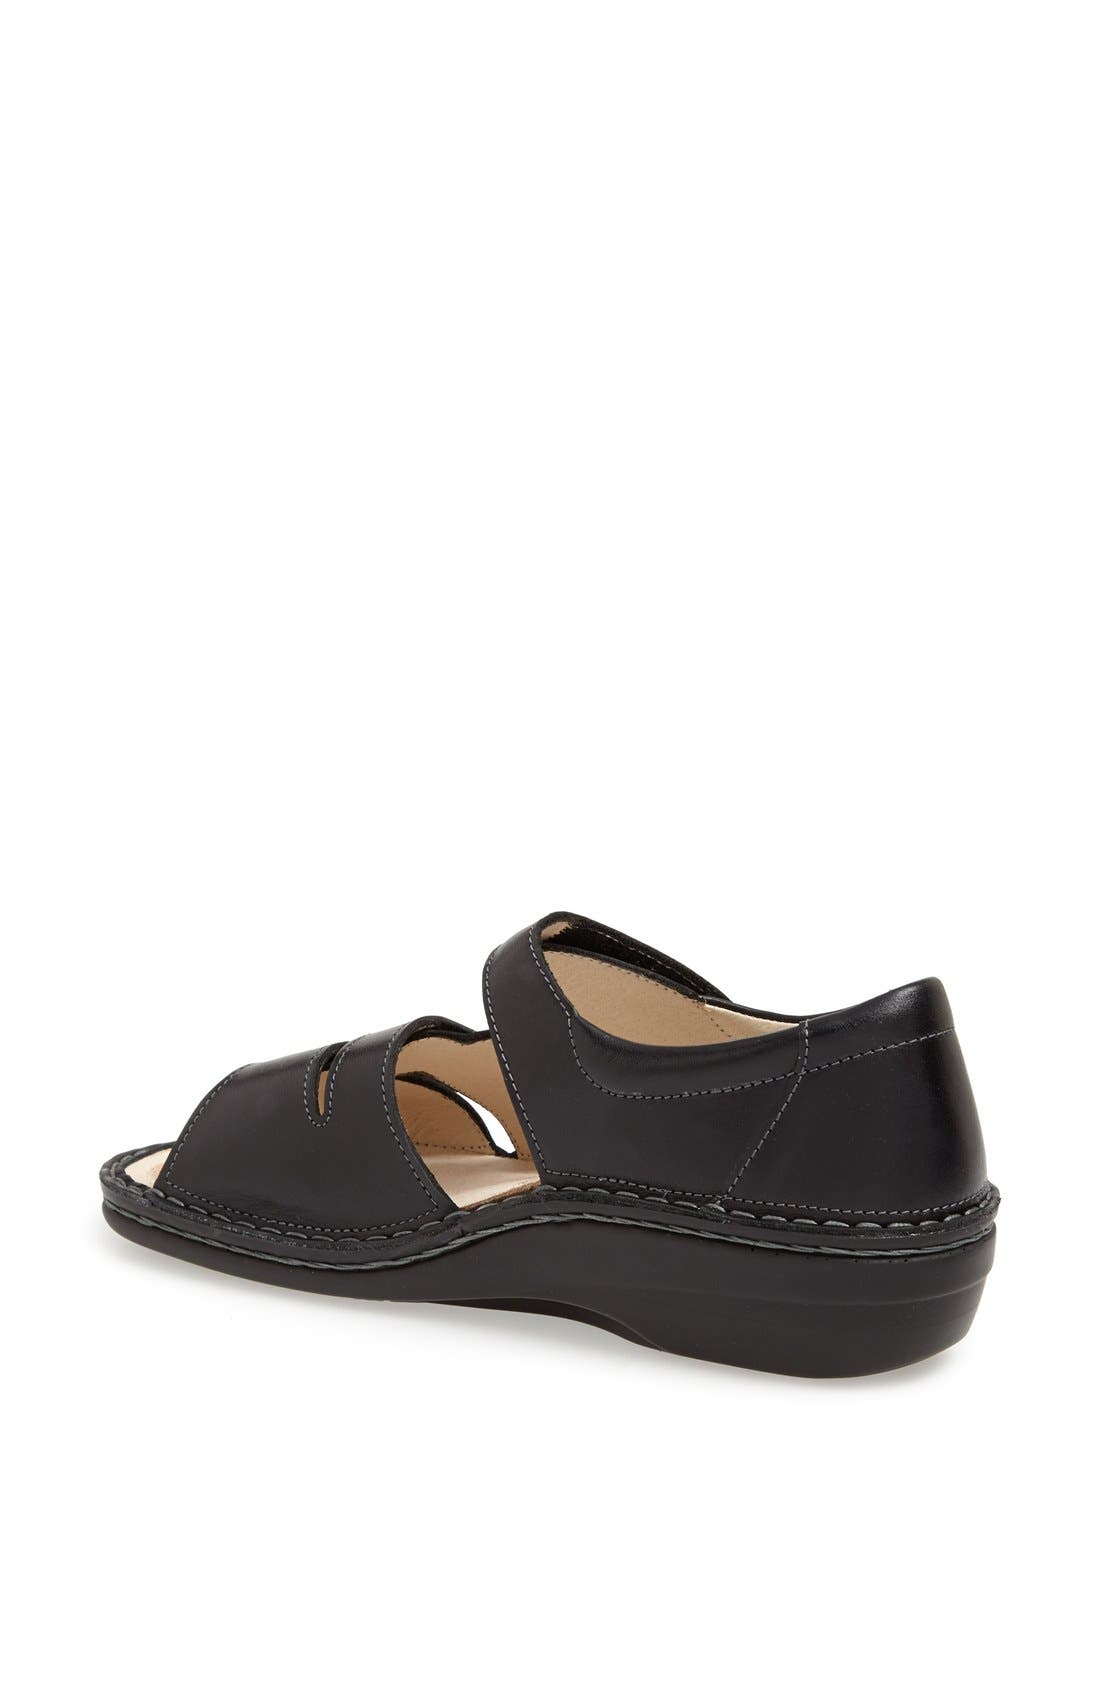 'Sintra' Sandal,                             Alternate thumbnail 2, color,                             Black